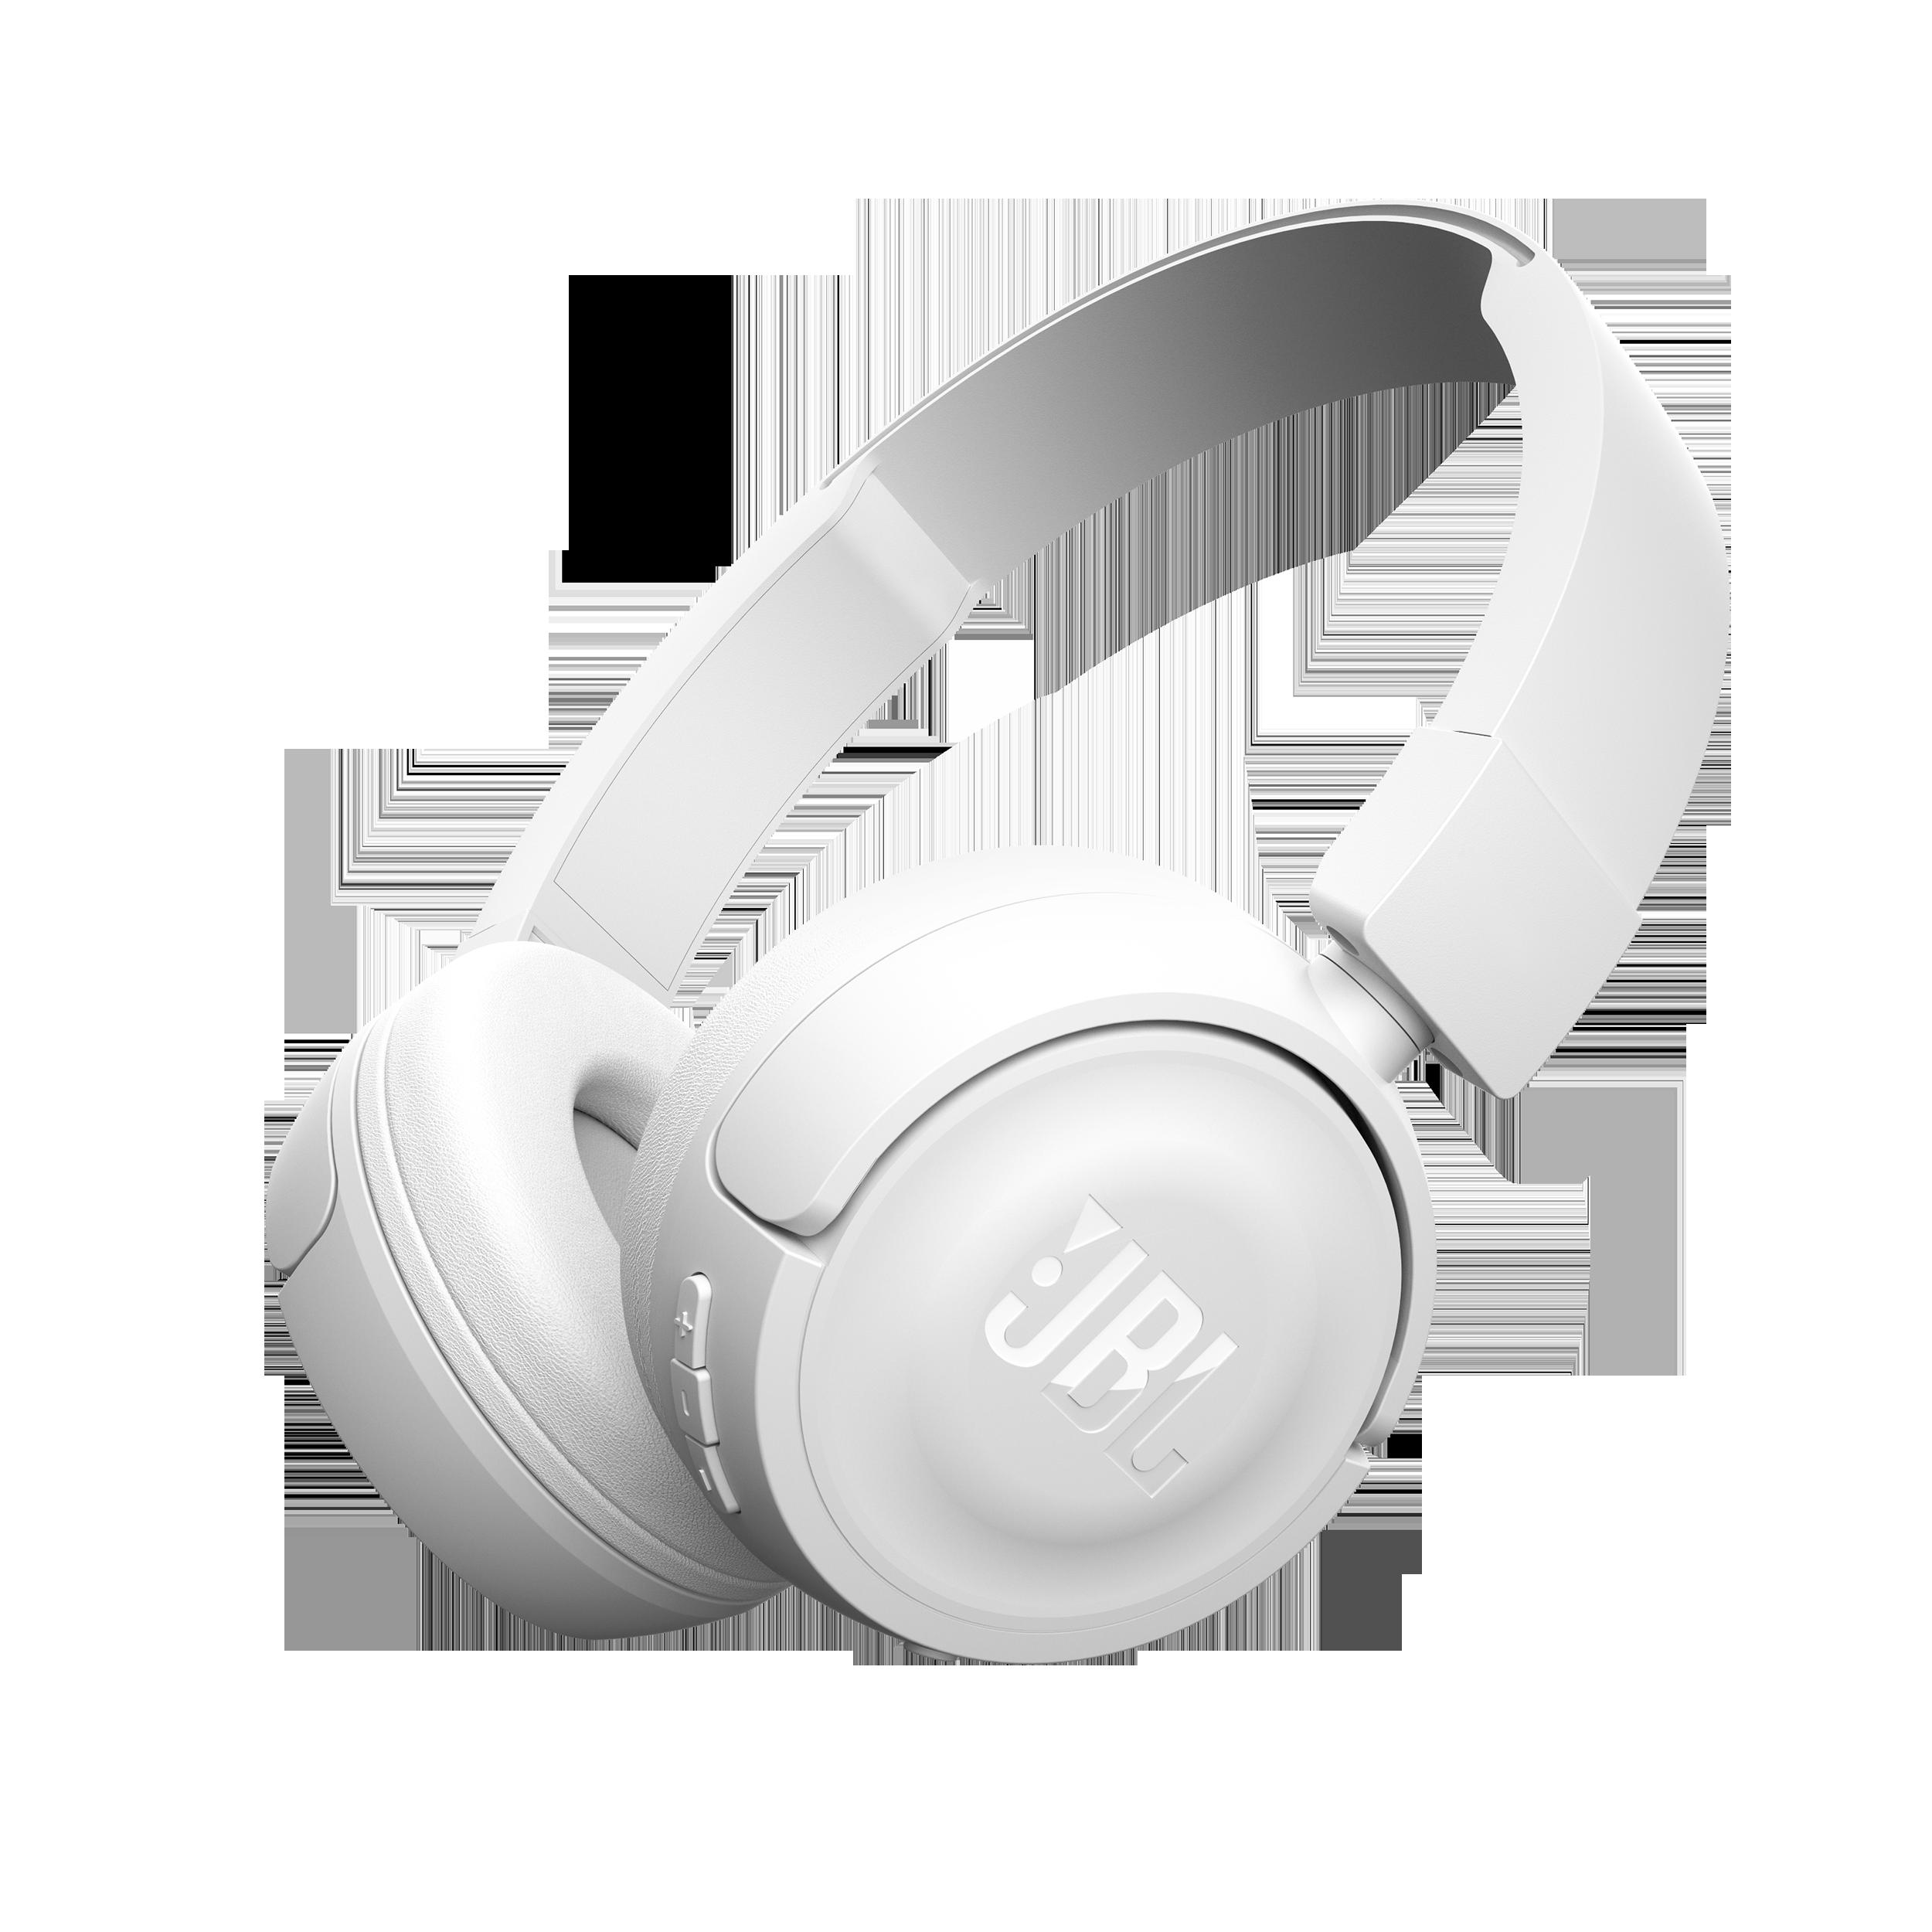 T450BT, on-ear HPH, mic/rm, white